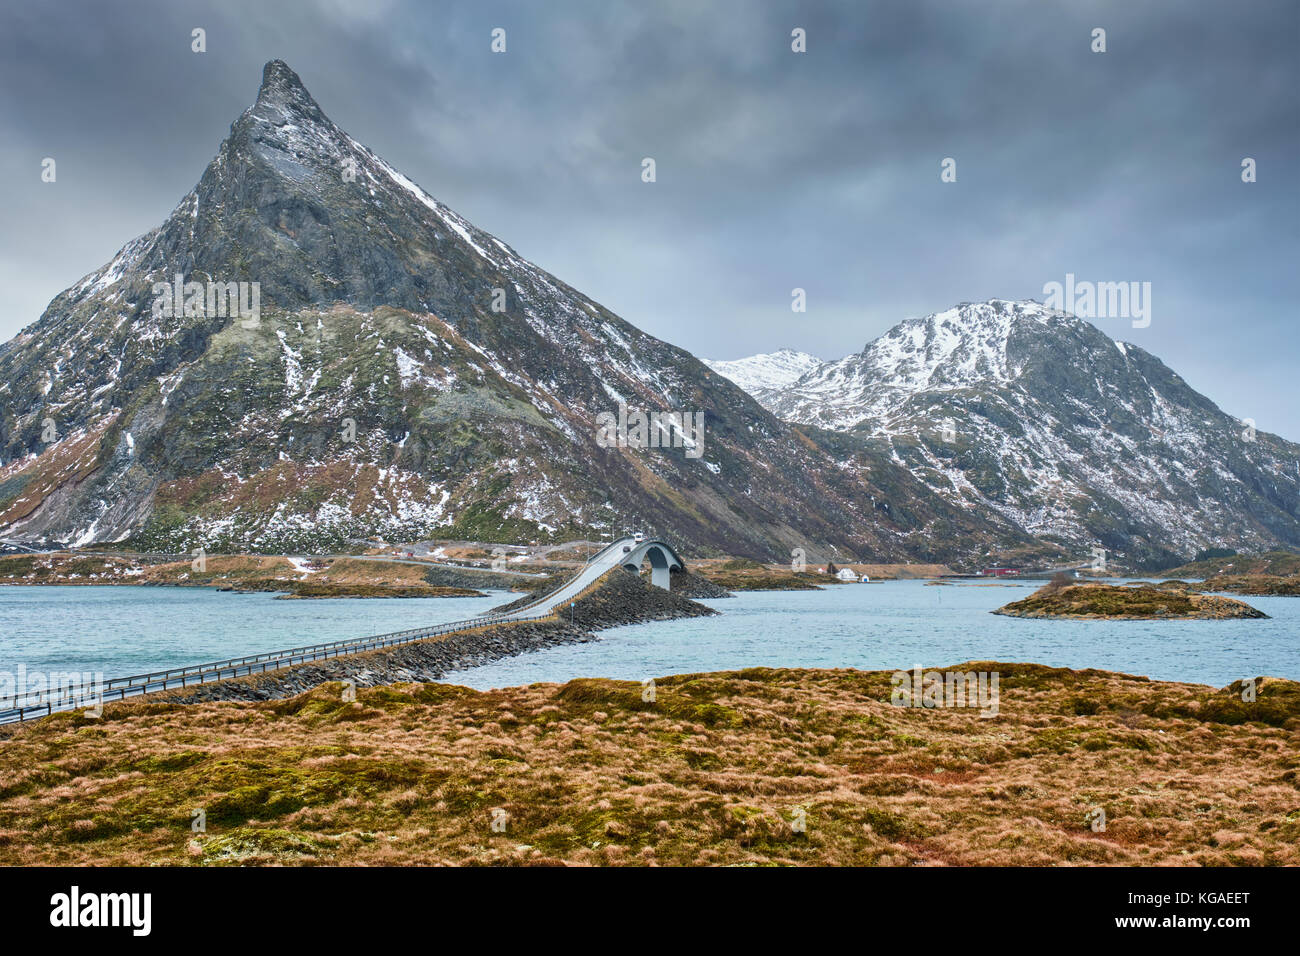 Ponts fredvang. îles Lofoten, Norvège Photo Stock